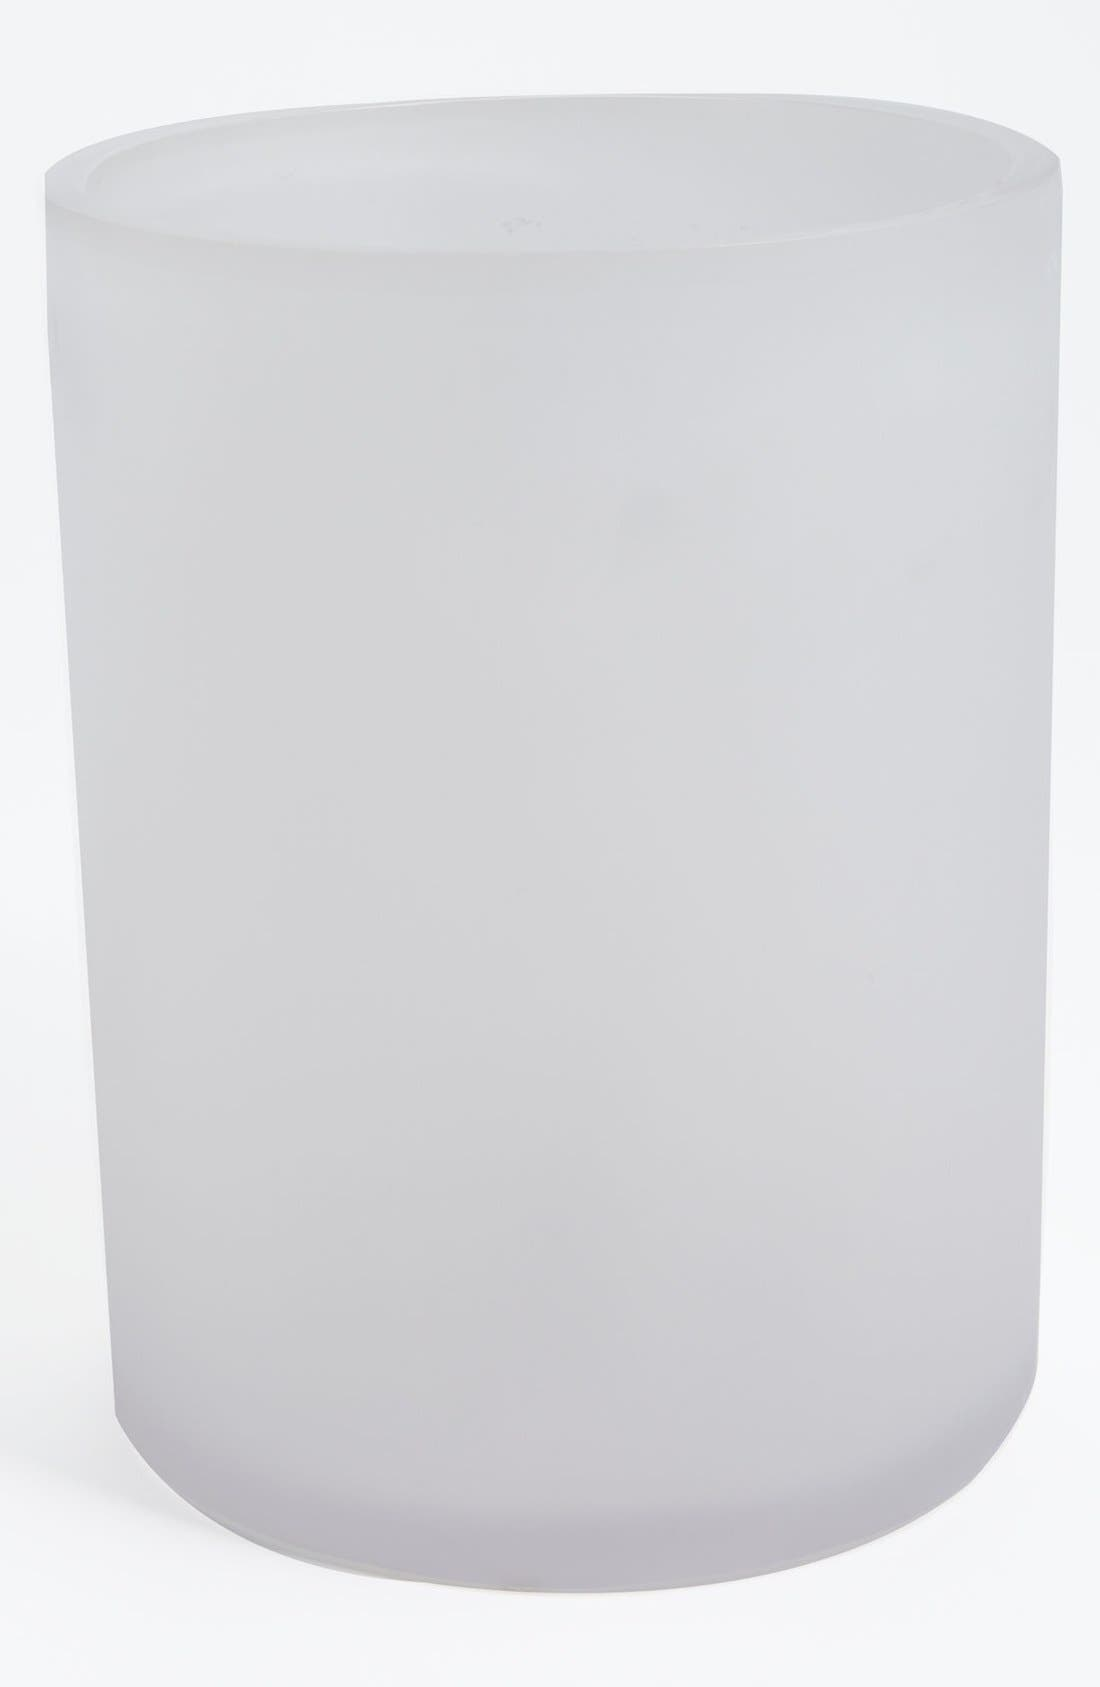 Main Image - Waterworks Studio 'Oxygen' Wastebasket (Online Only)